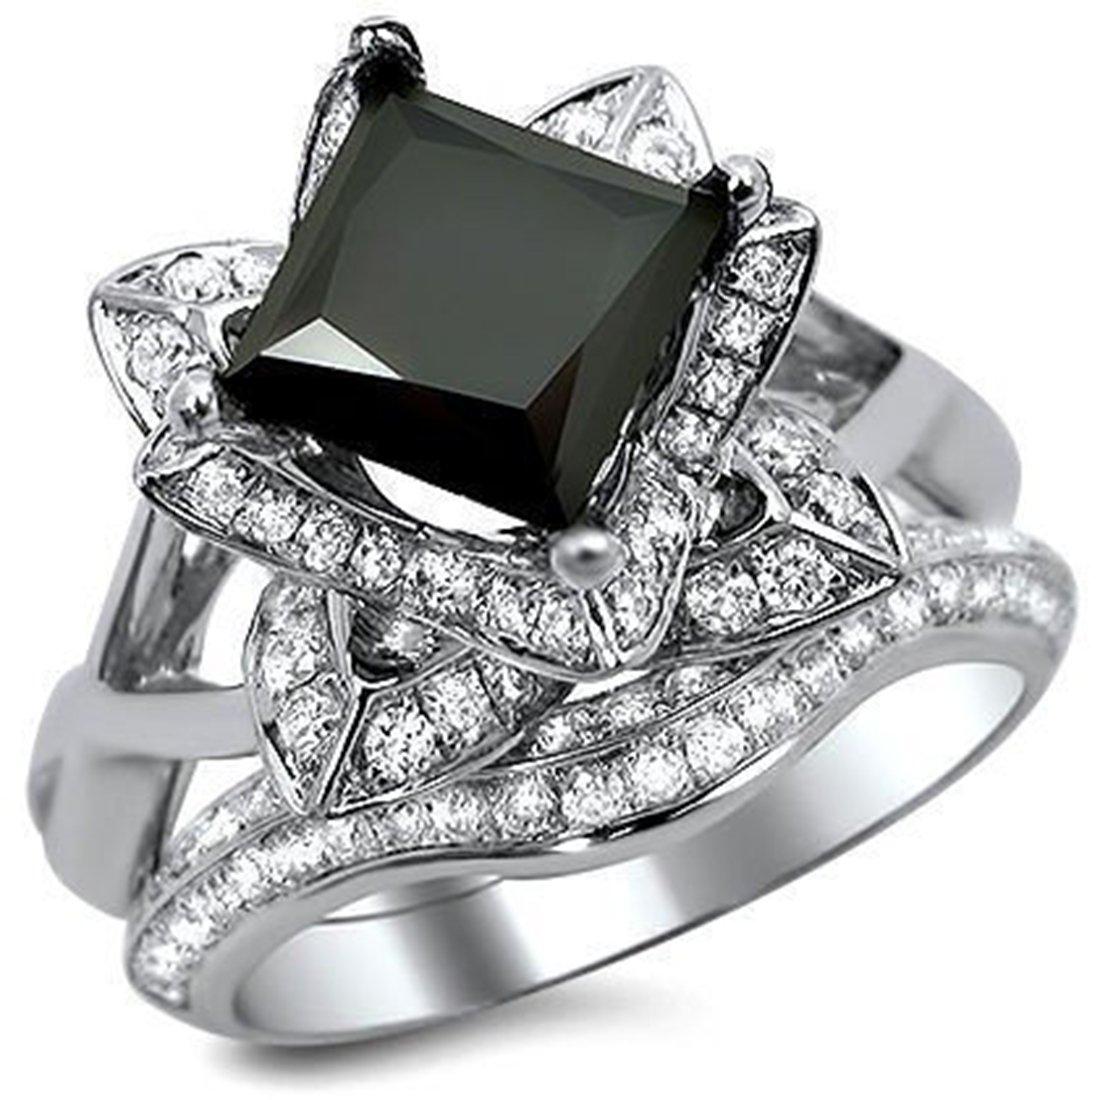 Smjewels 2.5Ct Black Princess Cut Lotus Flower CZ Diamond Engagement Ring Set In White Gold Fn